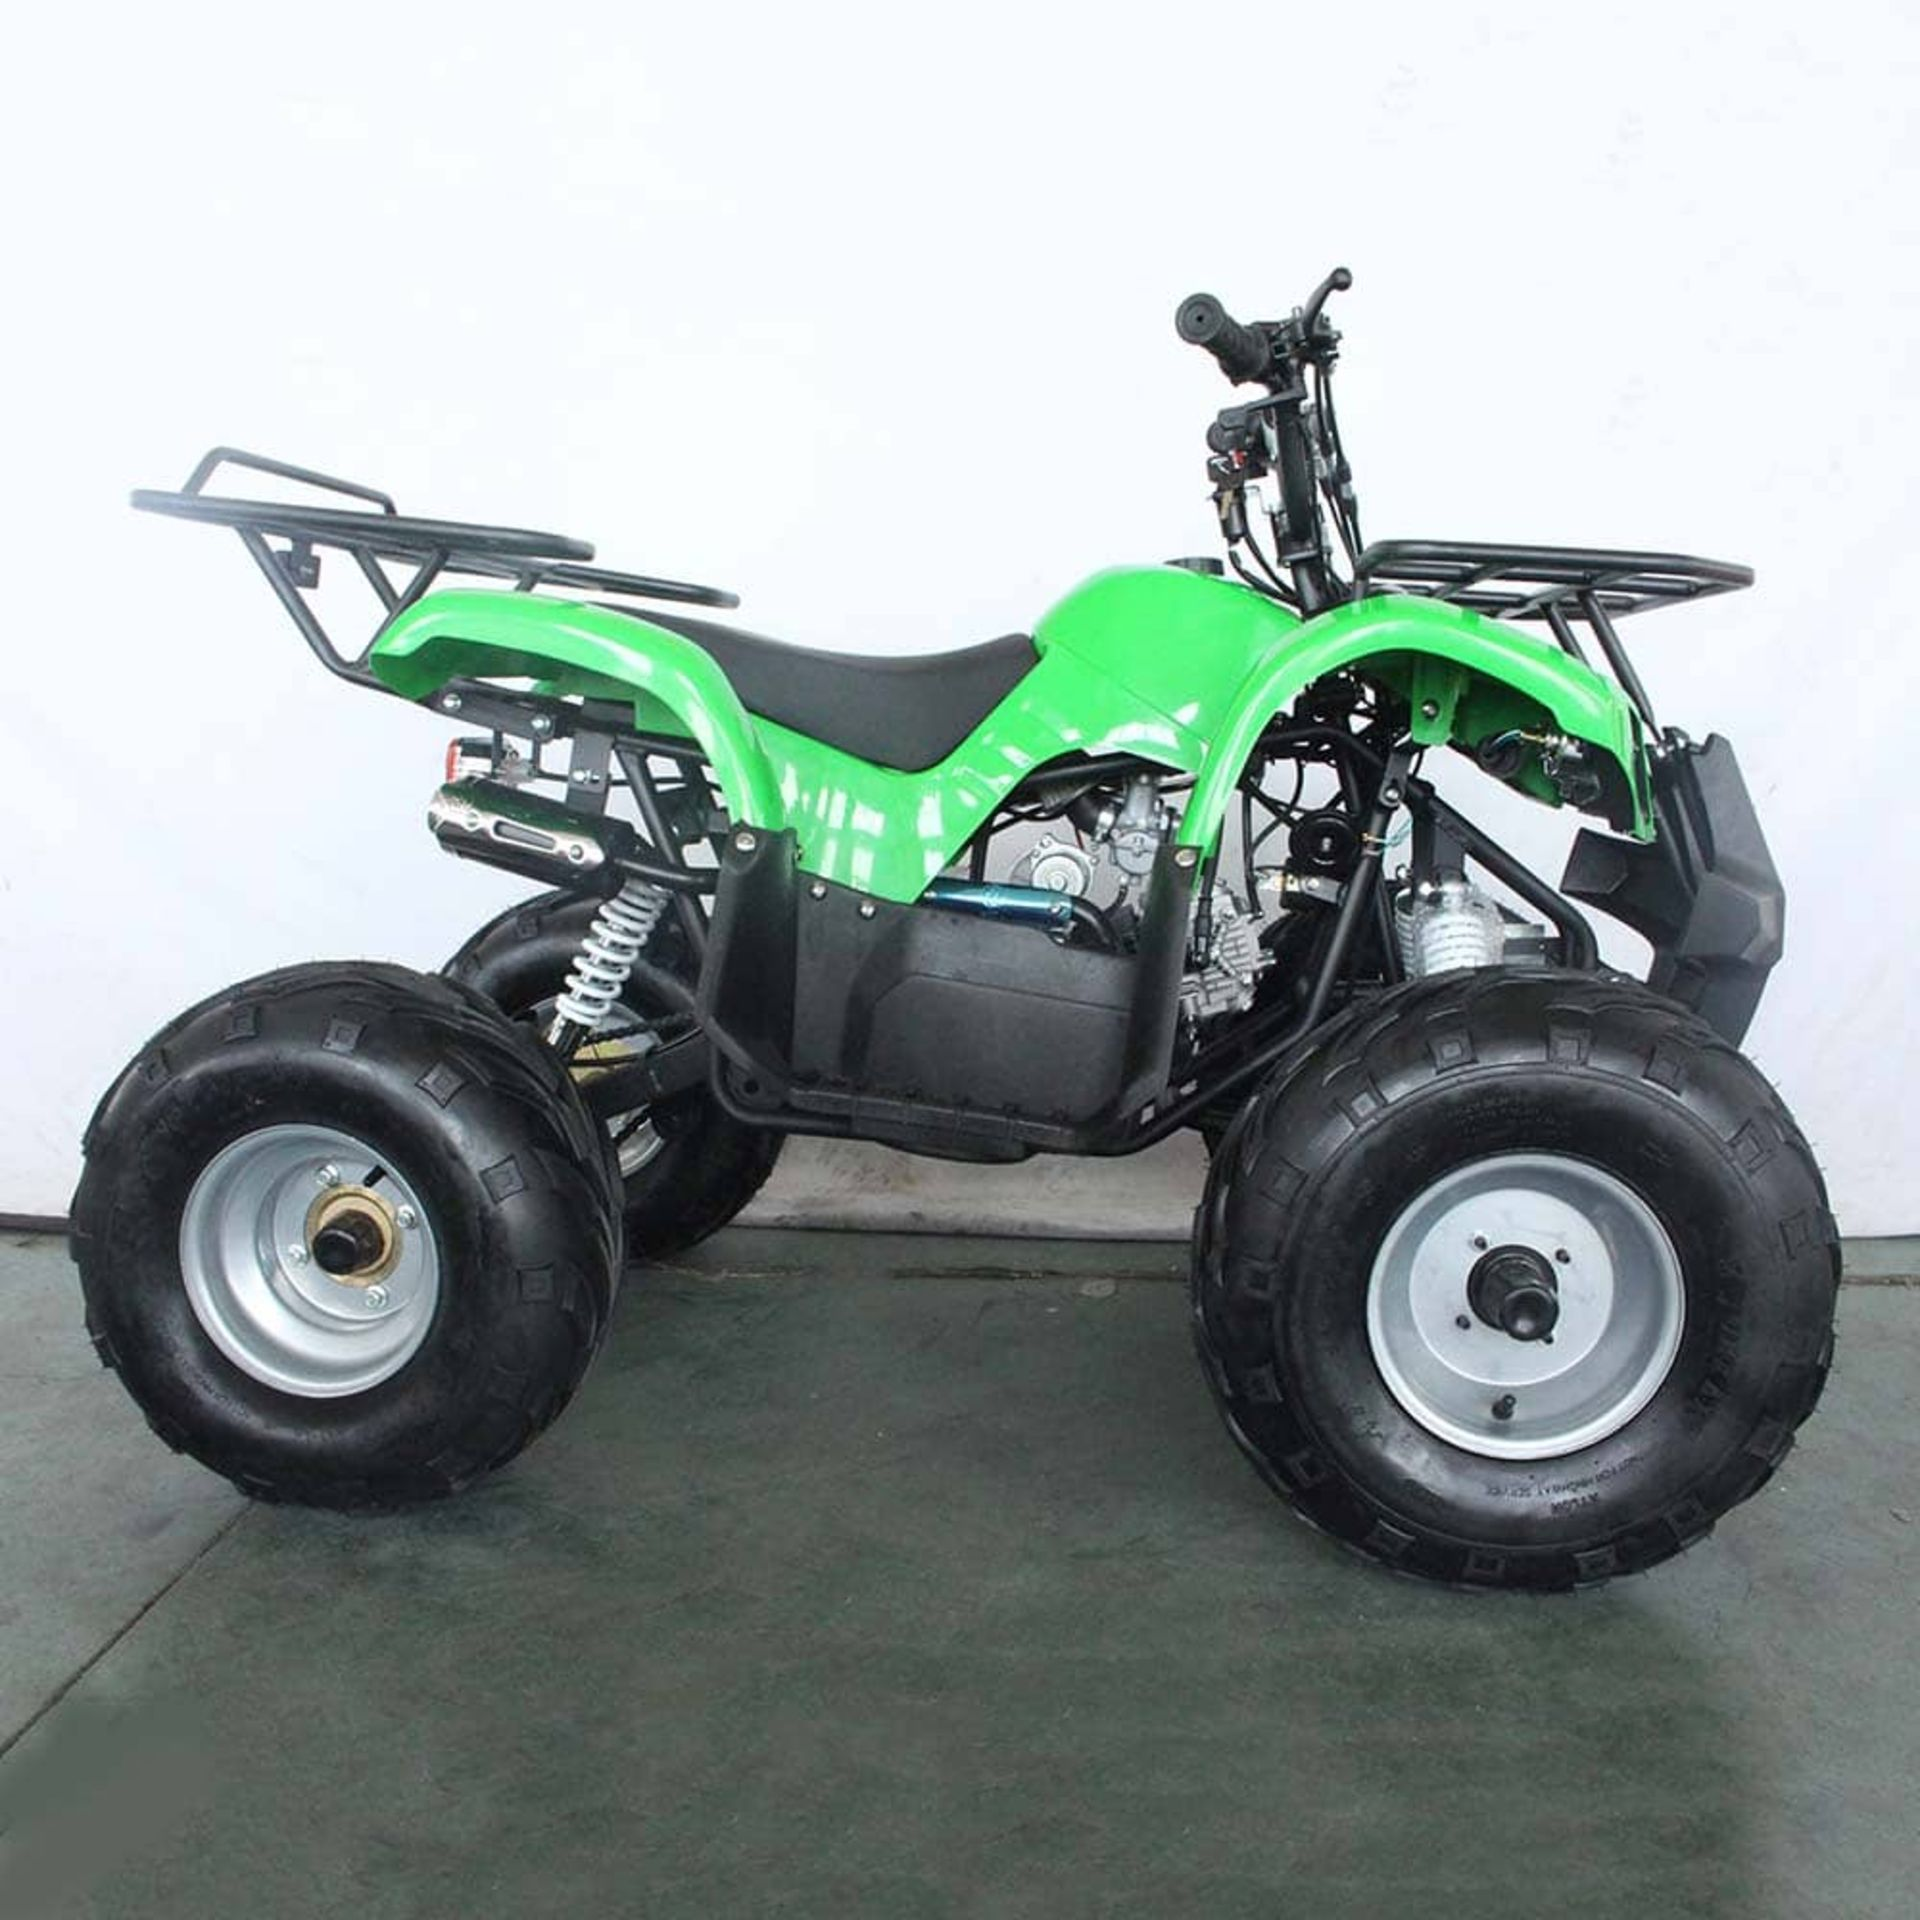 + VAT Brand New 125cc Condor Quad Bike - Four Stroke - Single Cylinder - Front Drum Brakes & Rear - Image 6 of 9